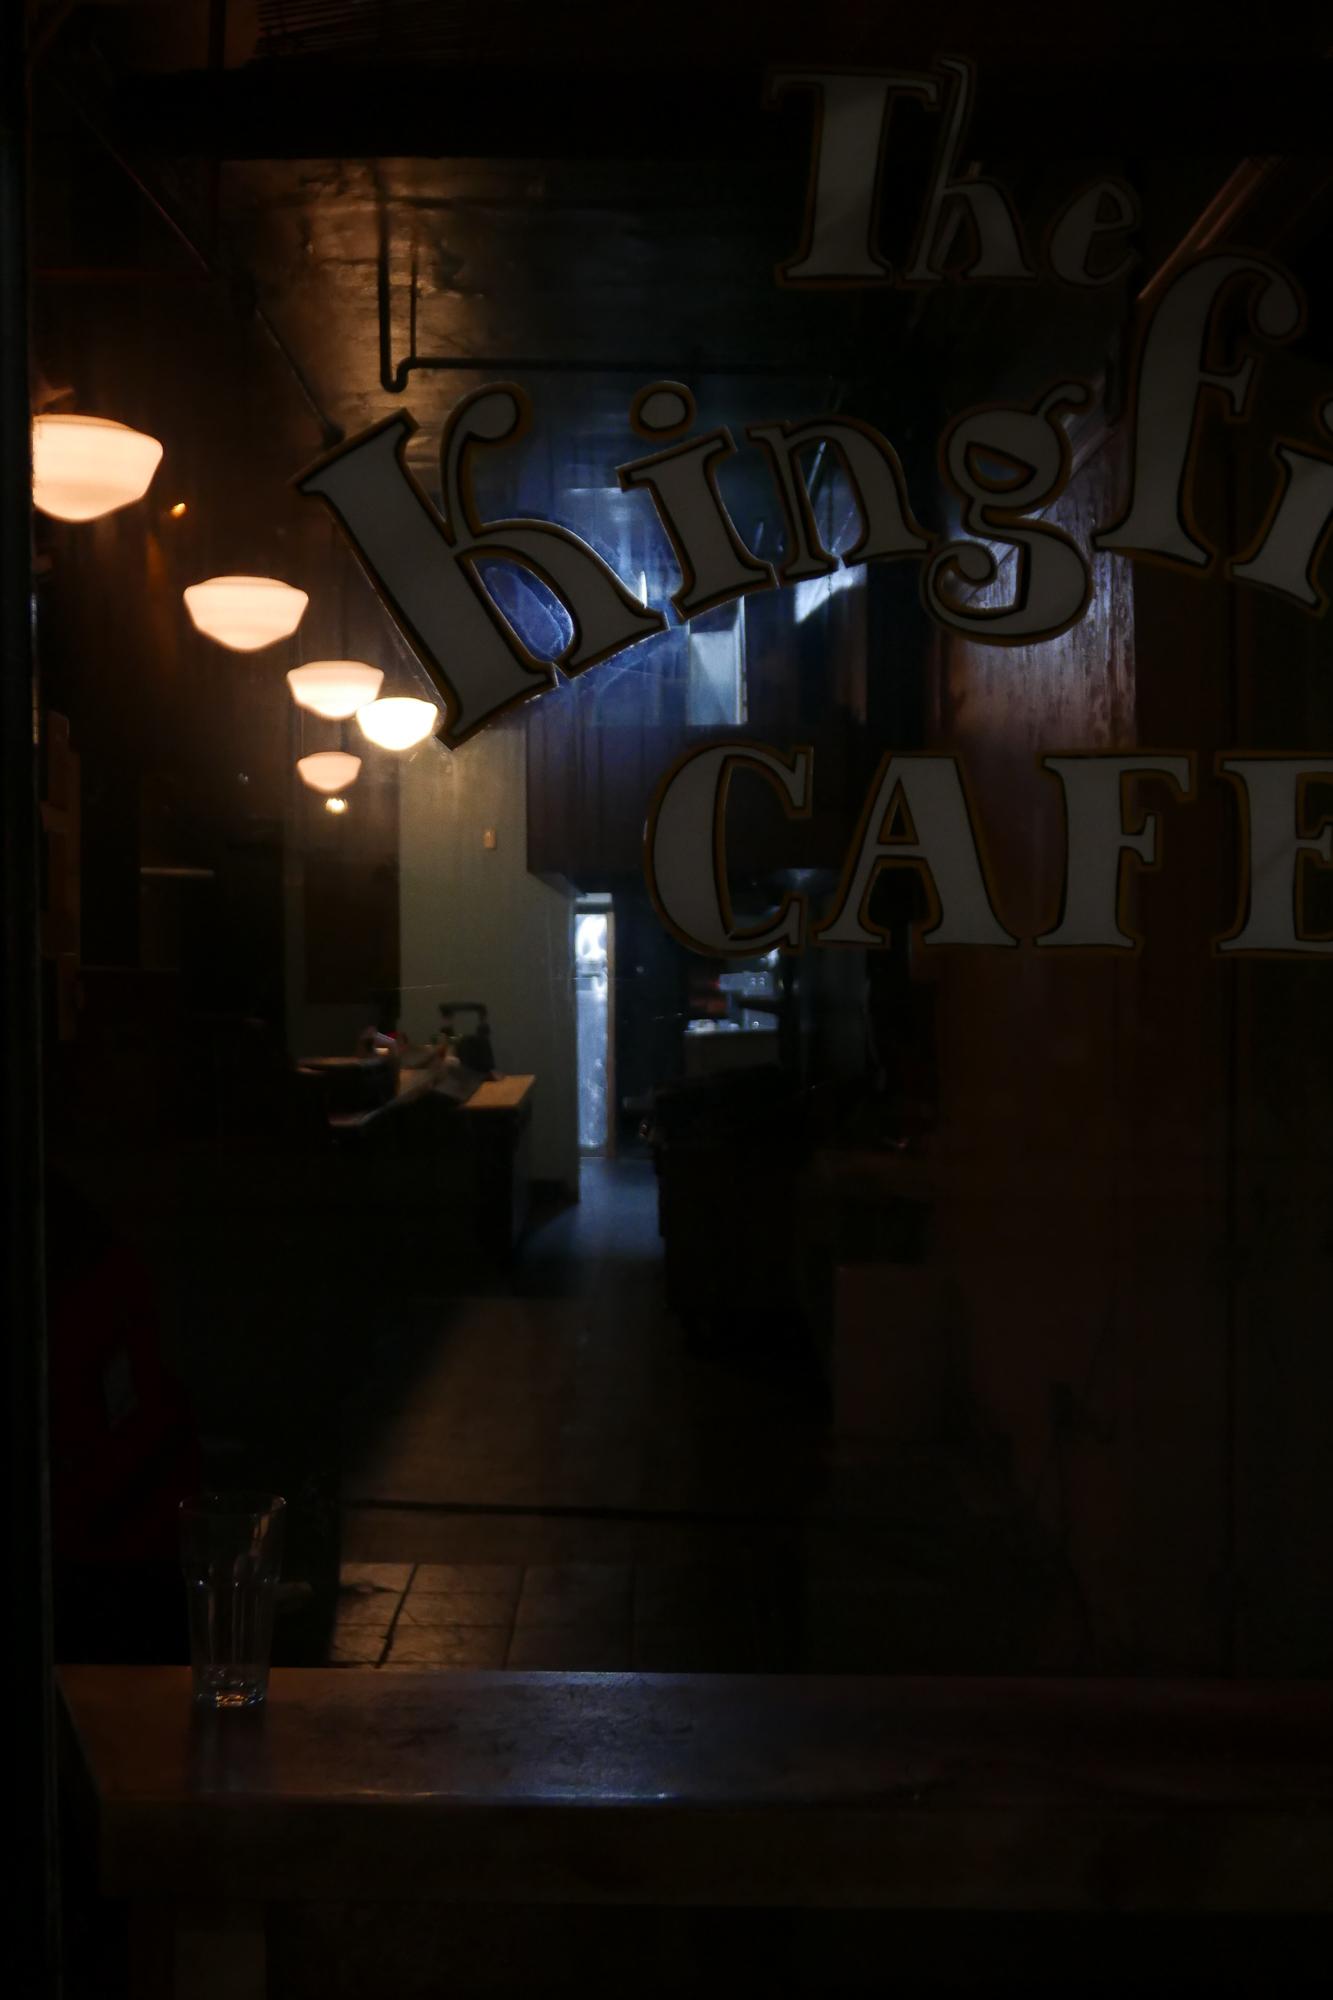 Kingfish Cafe